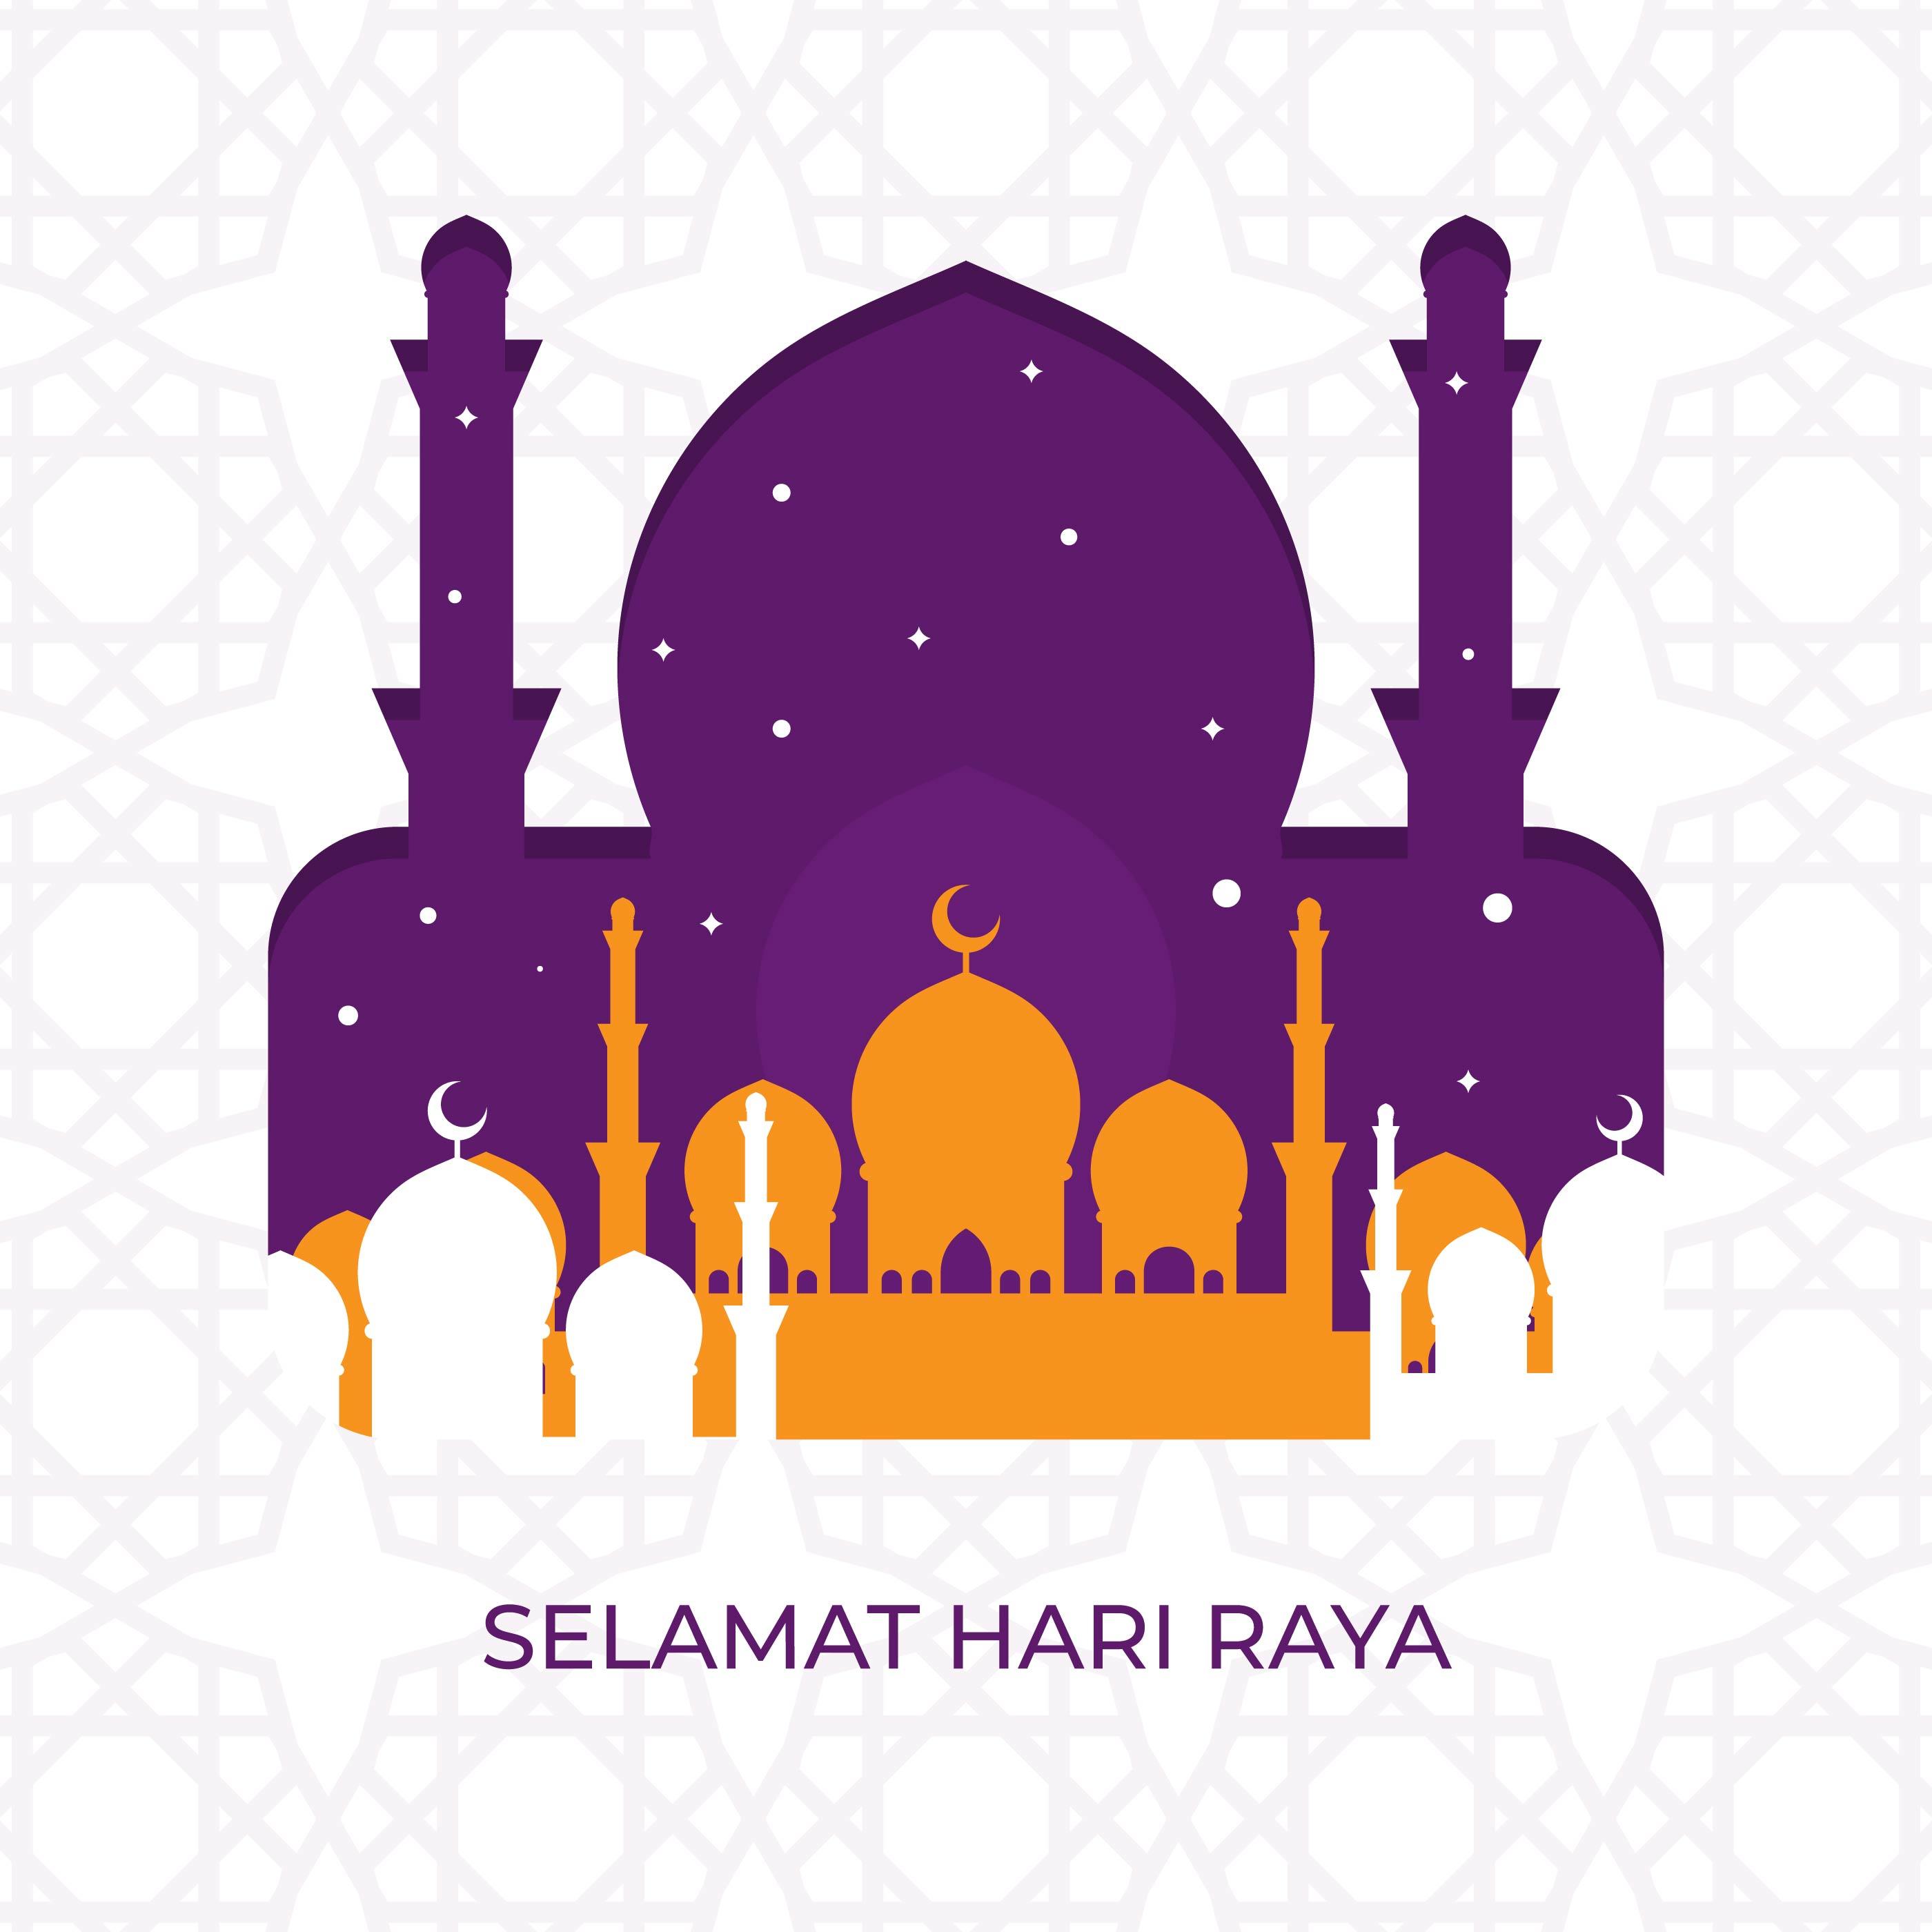 Flat Modern Selamat Hari Raya Eid Mubarak Greetings Vector Illustration Download Free Vectors Clipart Graphics Vector Art